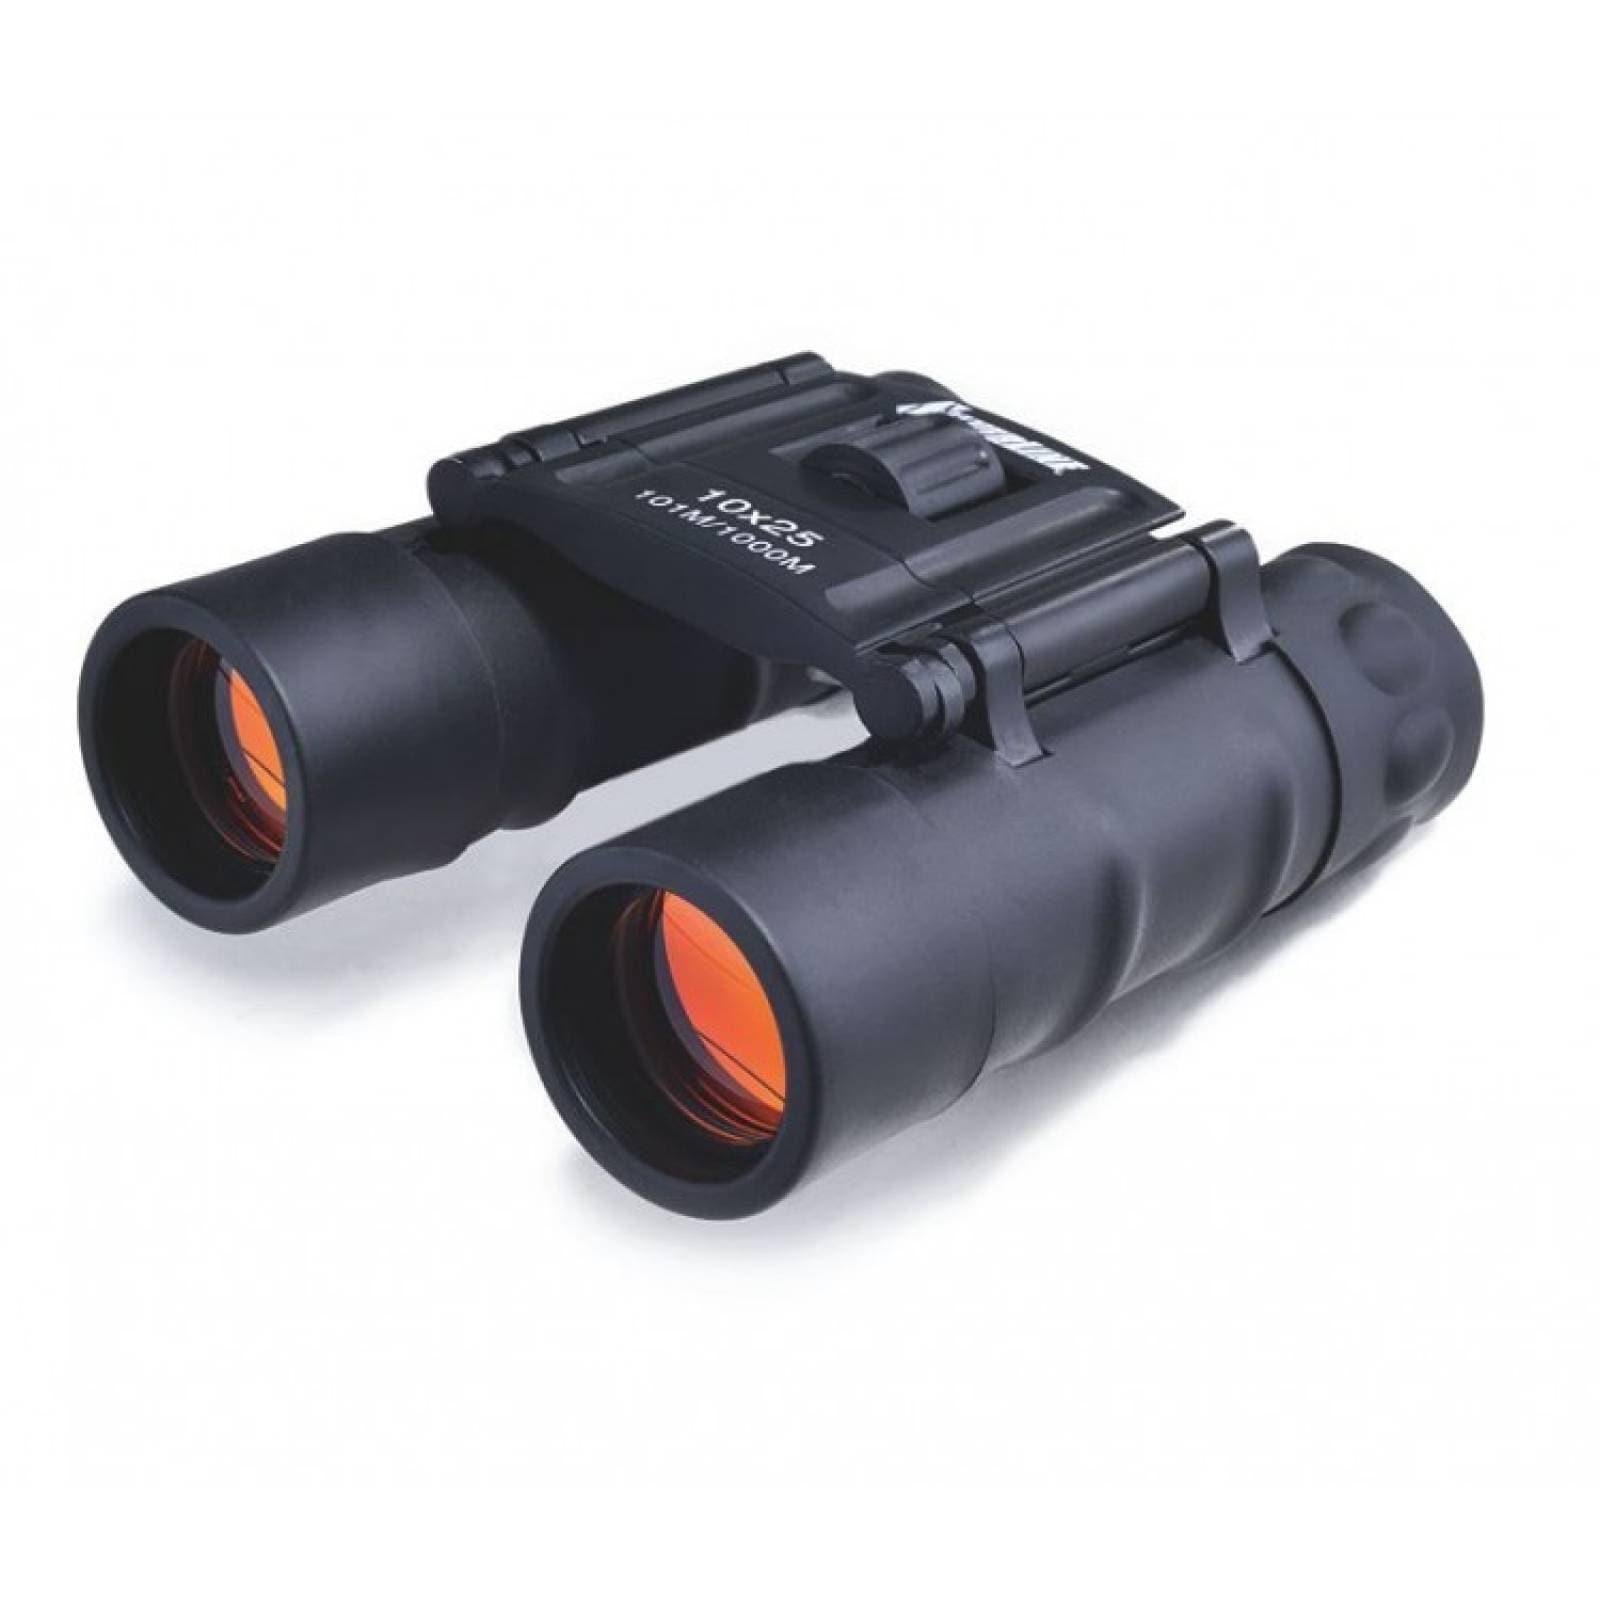 Binocular Zoom 10X / Diámetro Del Objetivo: 25mm